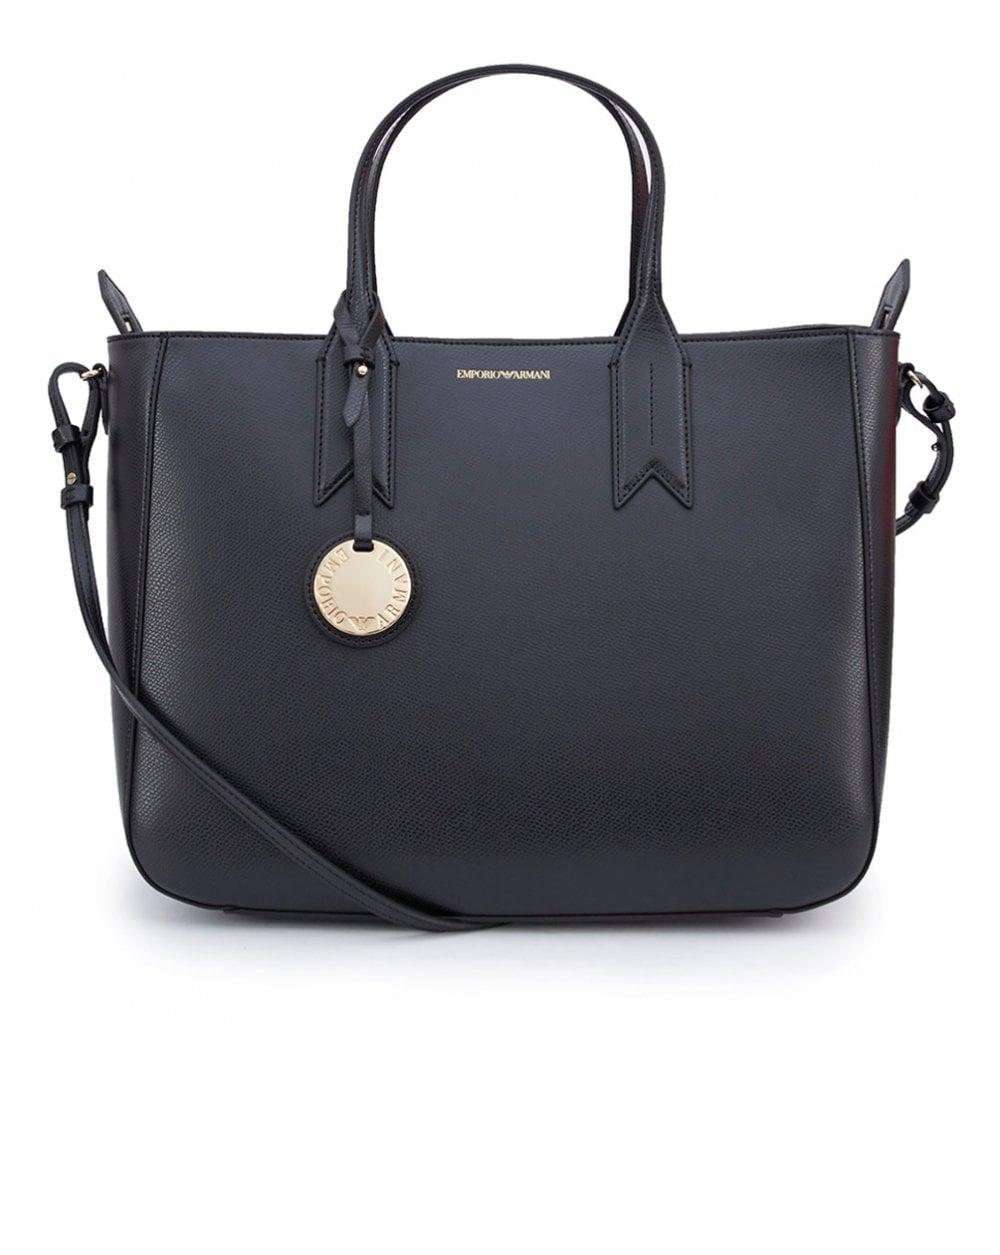 Lyst - Emporio Armani Frida Zip Top Tote Bag in Black for Men ed62509aadcfb